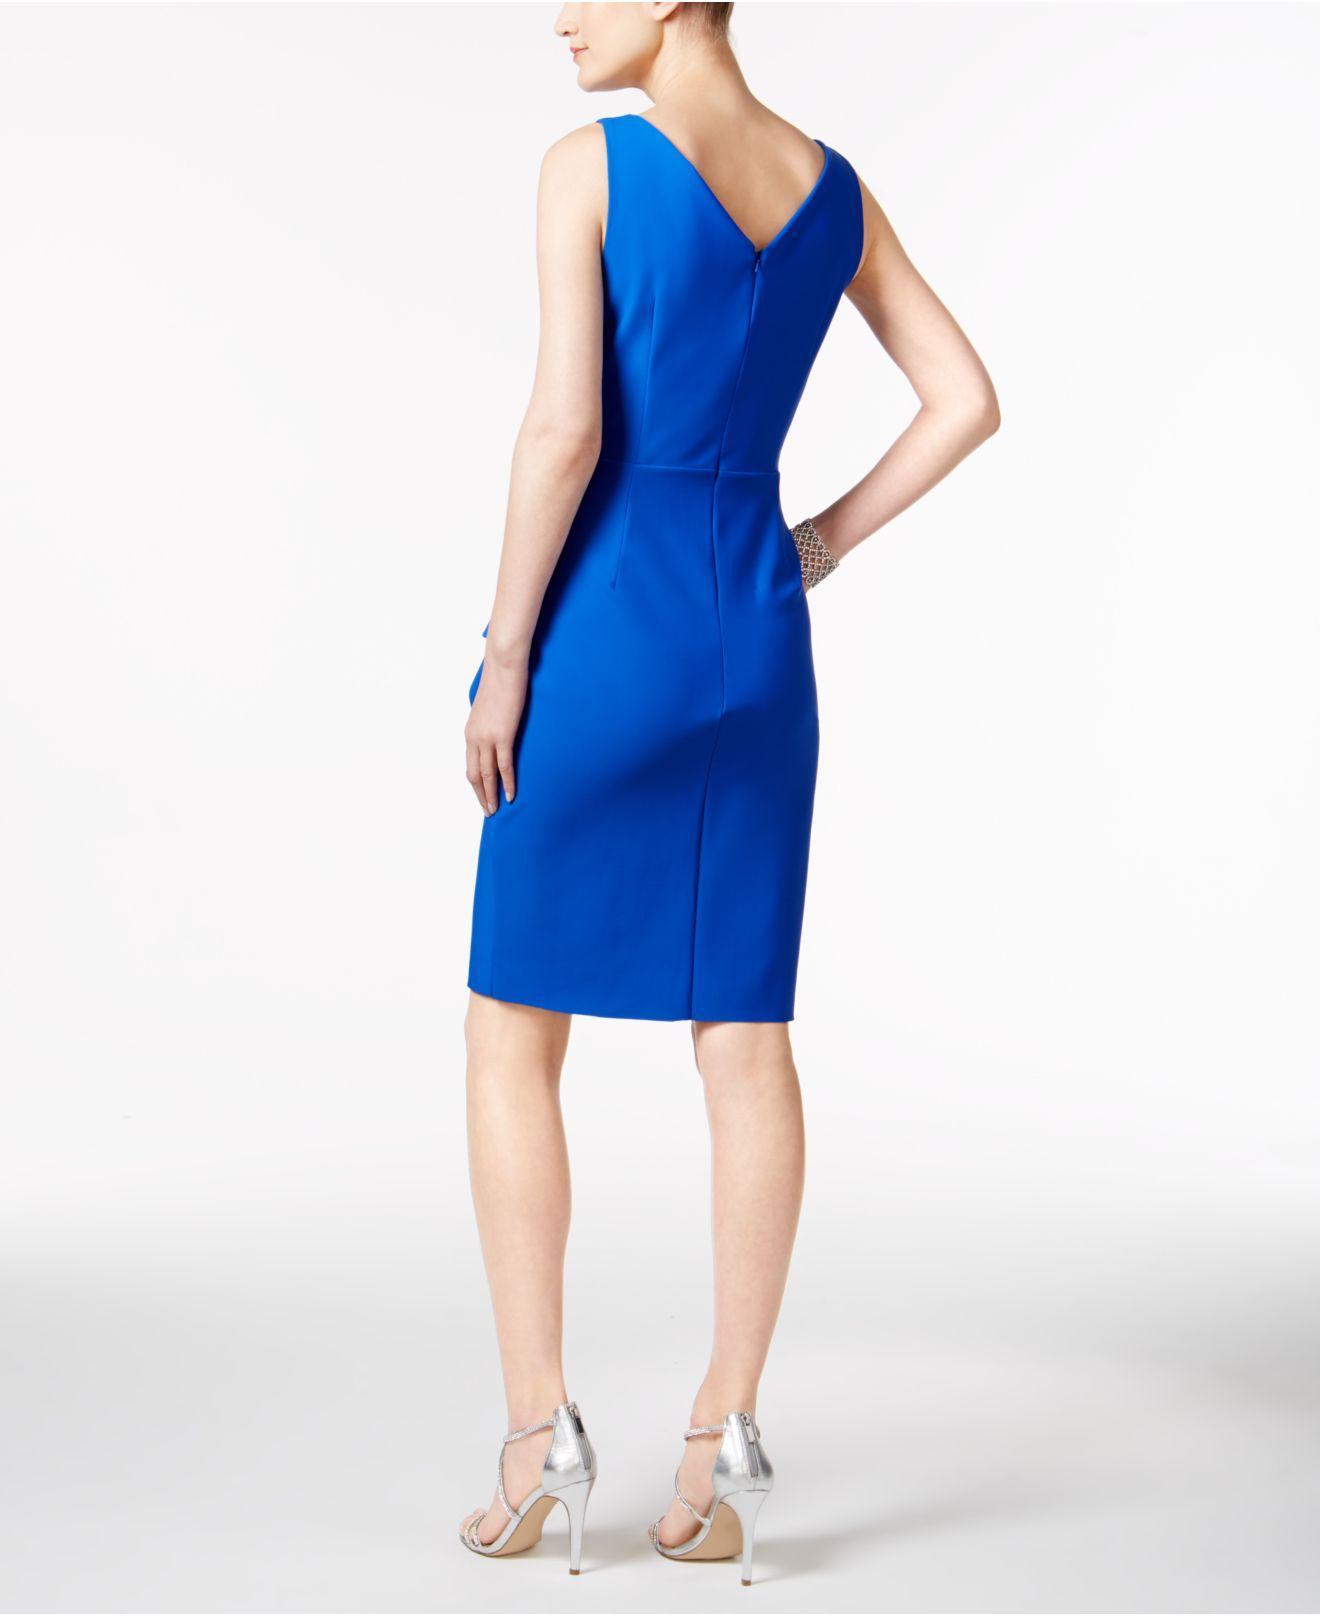 71494c589b Lyst - Alex Evenings Compression Embellished Ruched Sheath Dress in Blue -  Save 26%